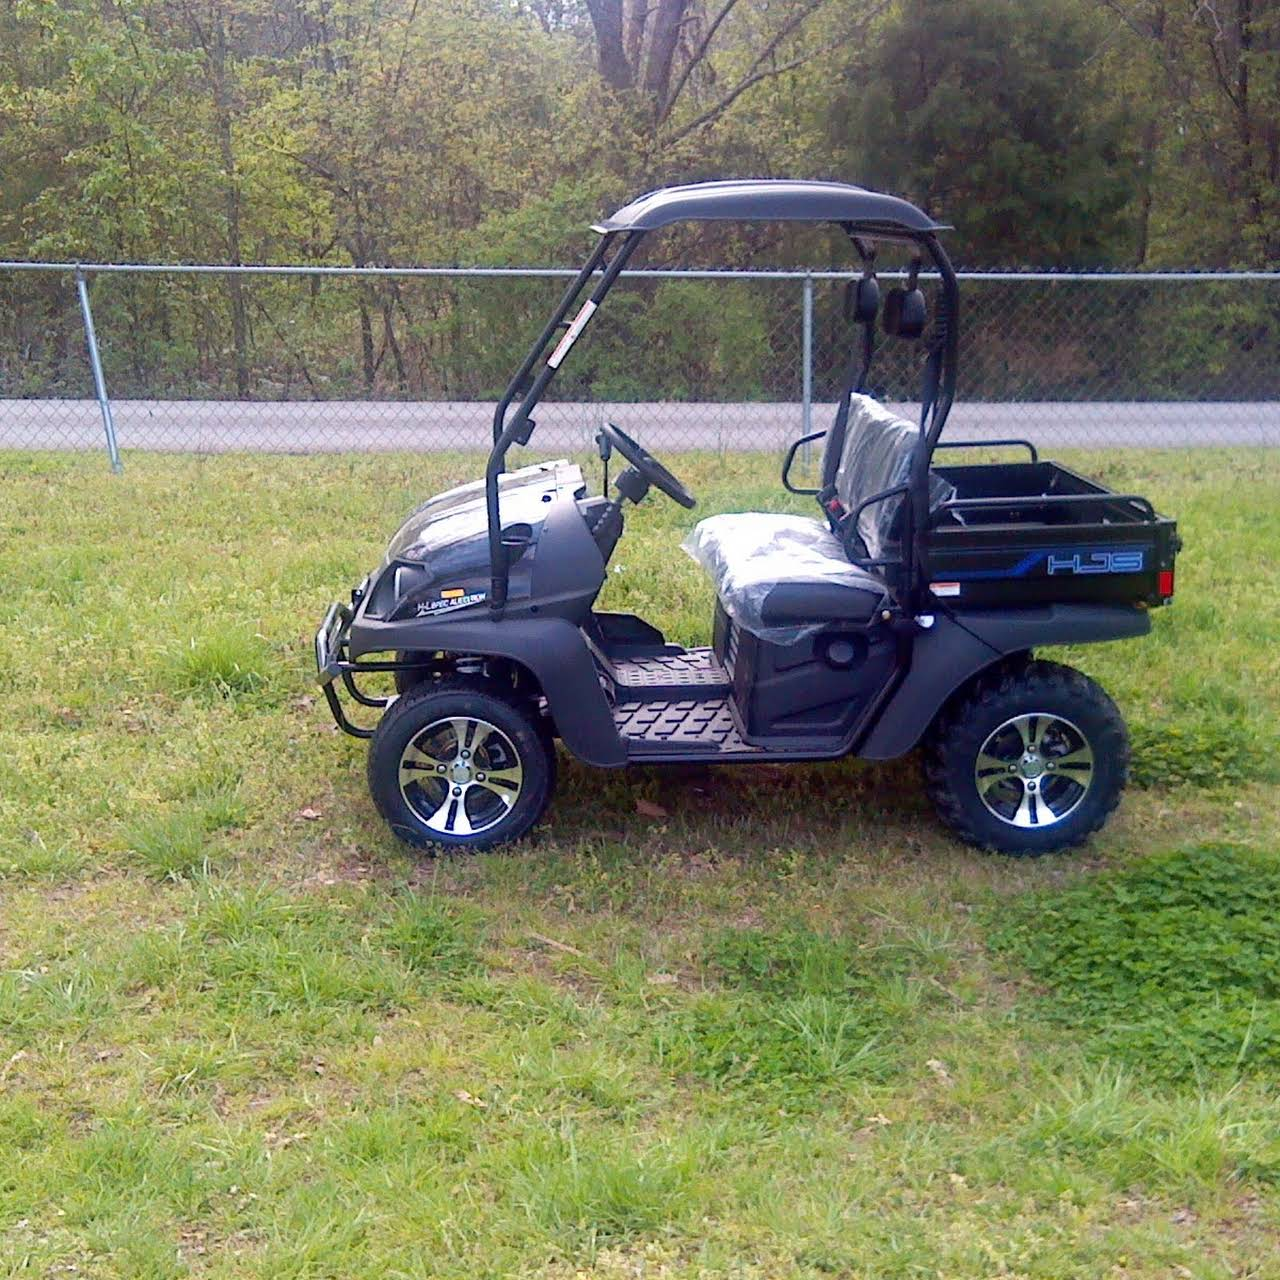 Oconee Speed/Sport-UTV/ATV - Off Road Vehicle Dealer in Bogart